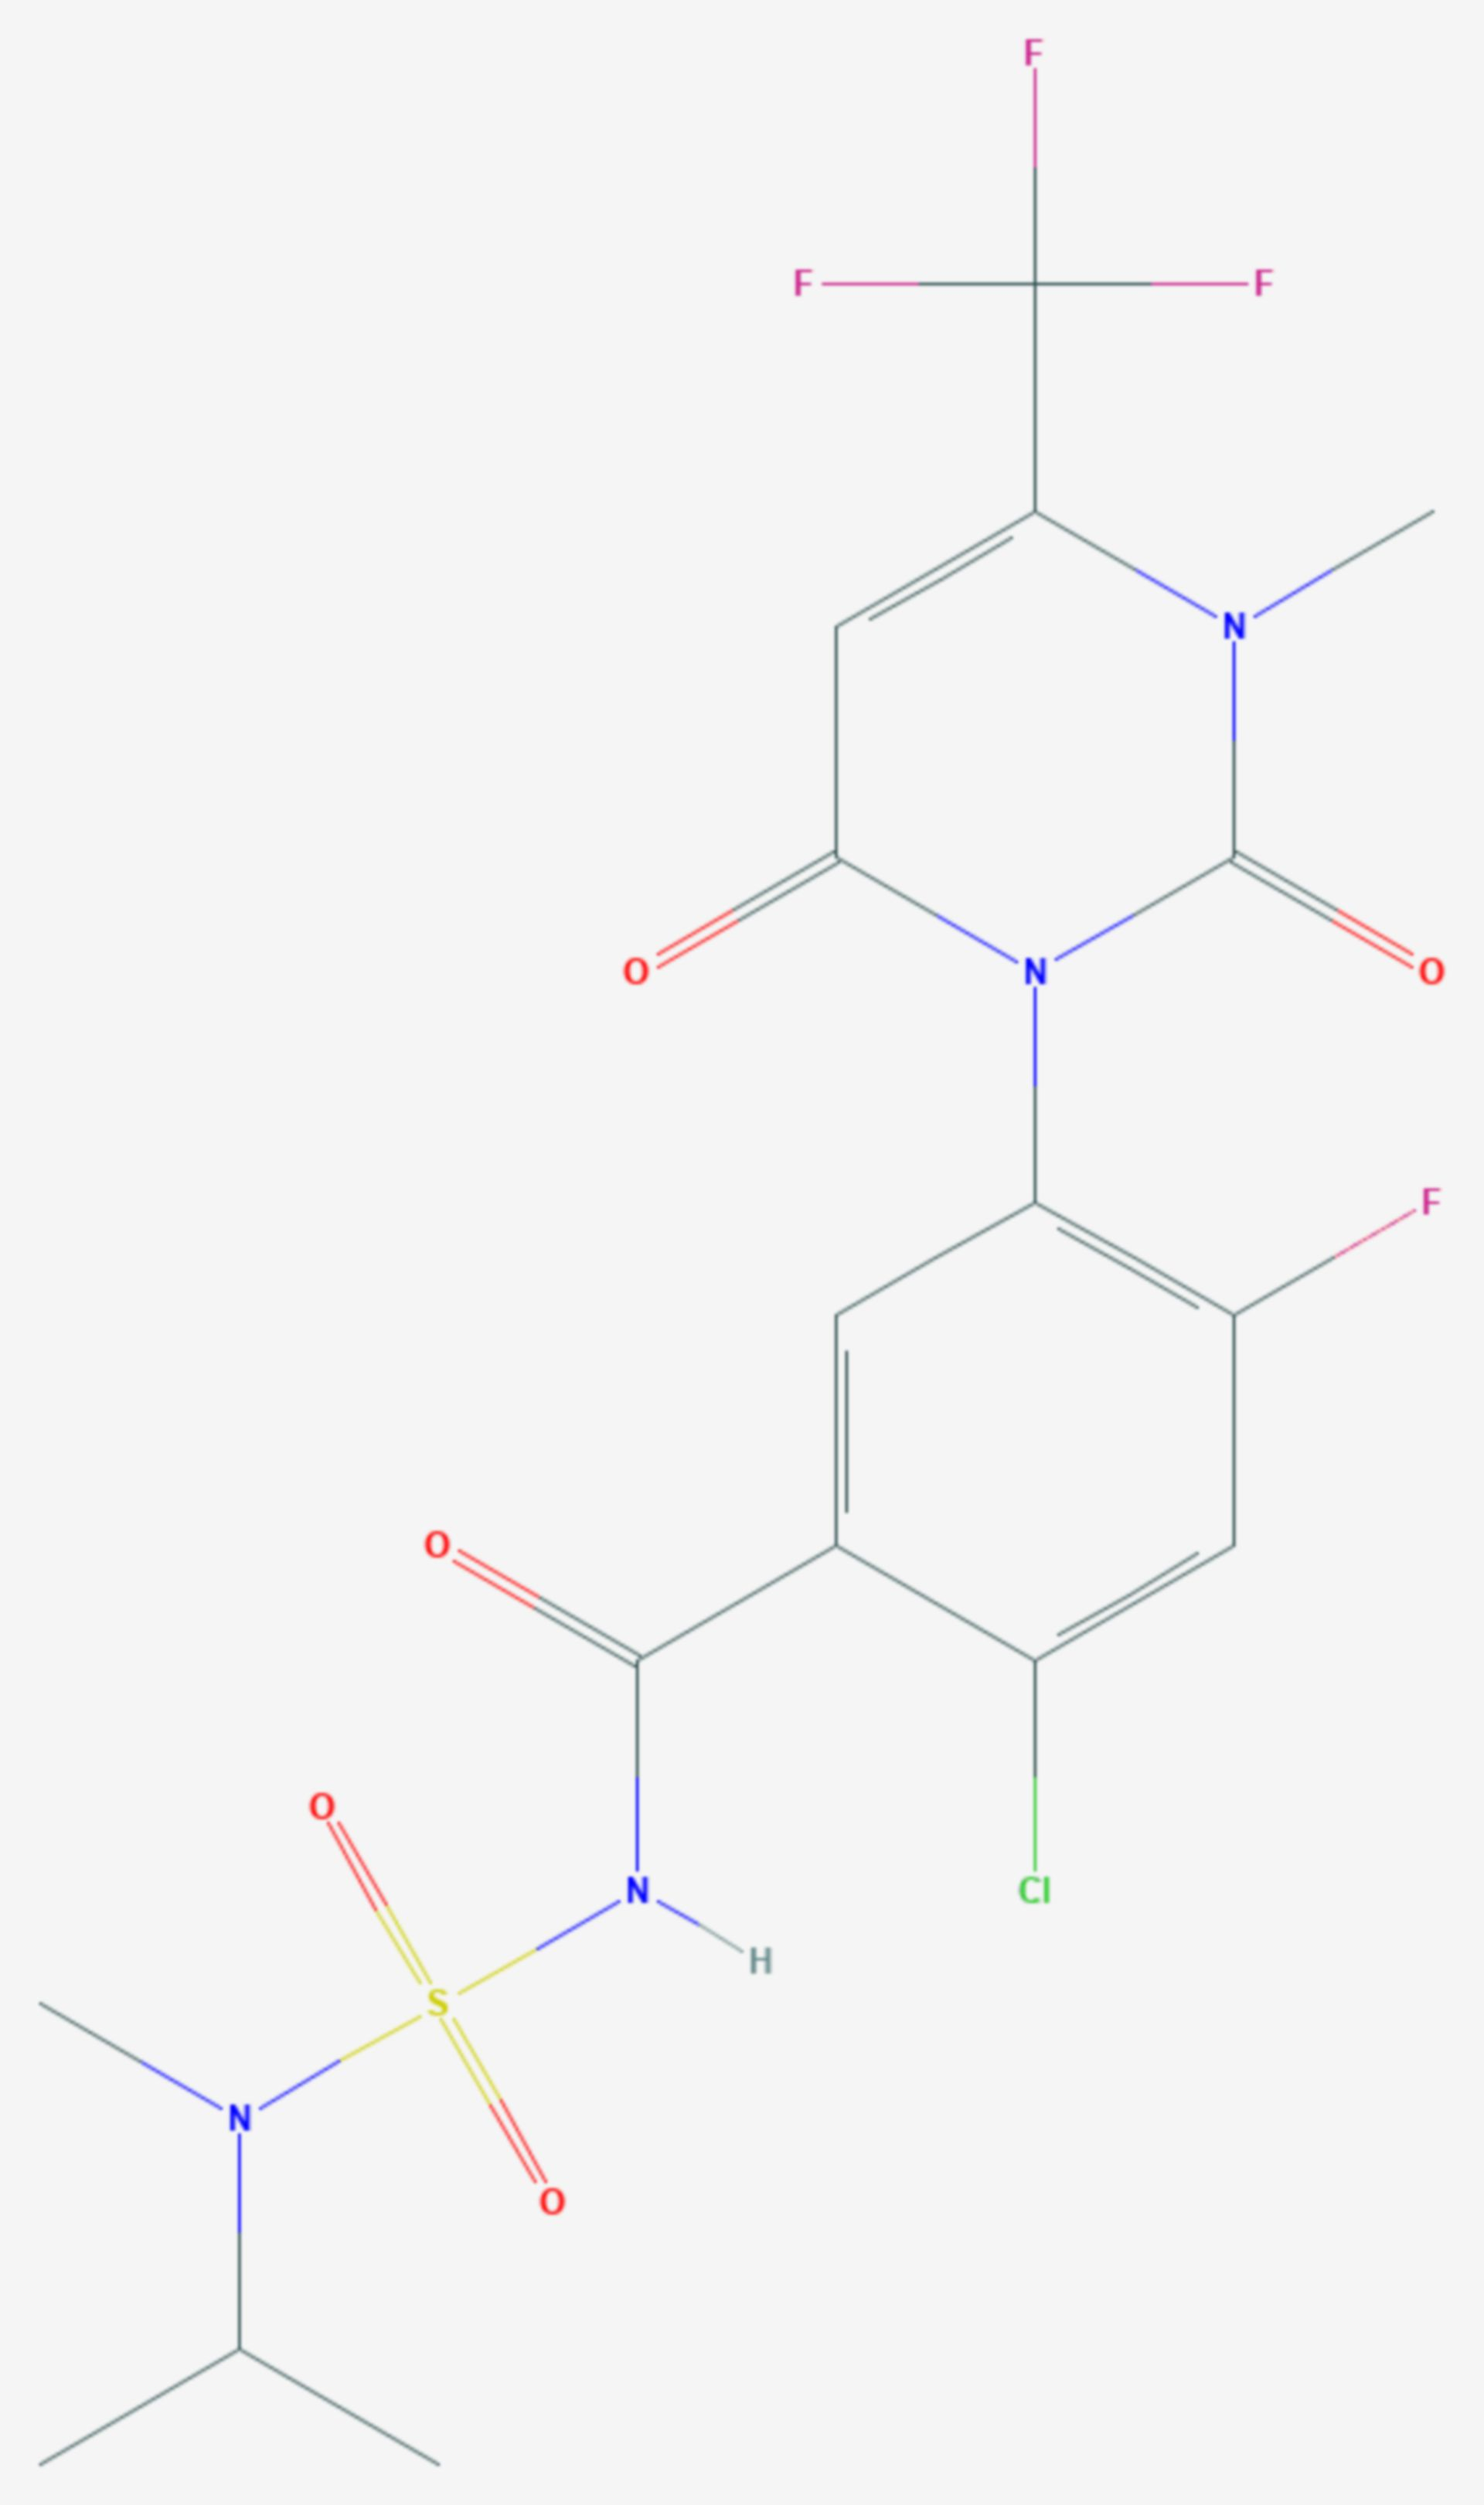 Saflufenacil (Strukturformel)